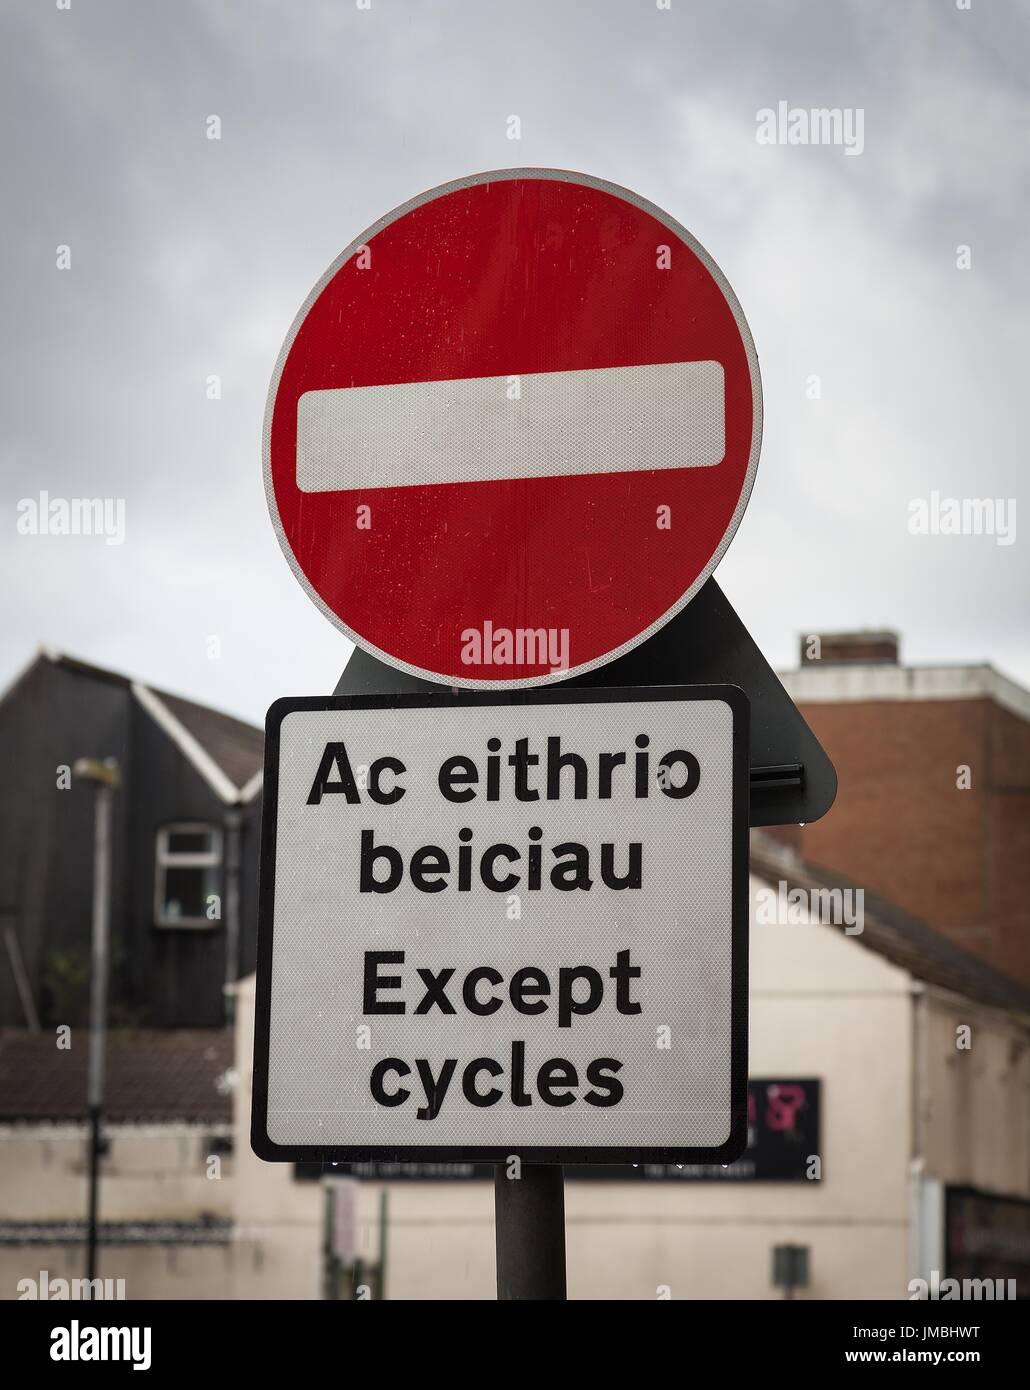 bilingual no entry sign JMBHWT prohibitive stock photos & prohibitive stock images alamy  at gsmportal.co